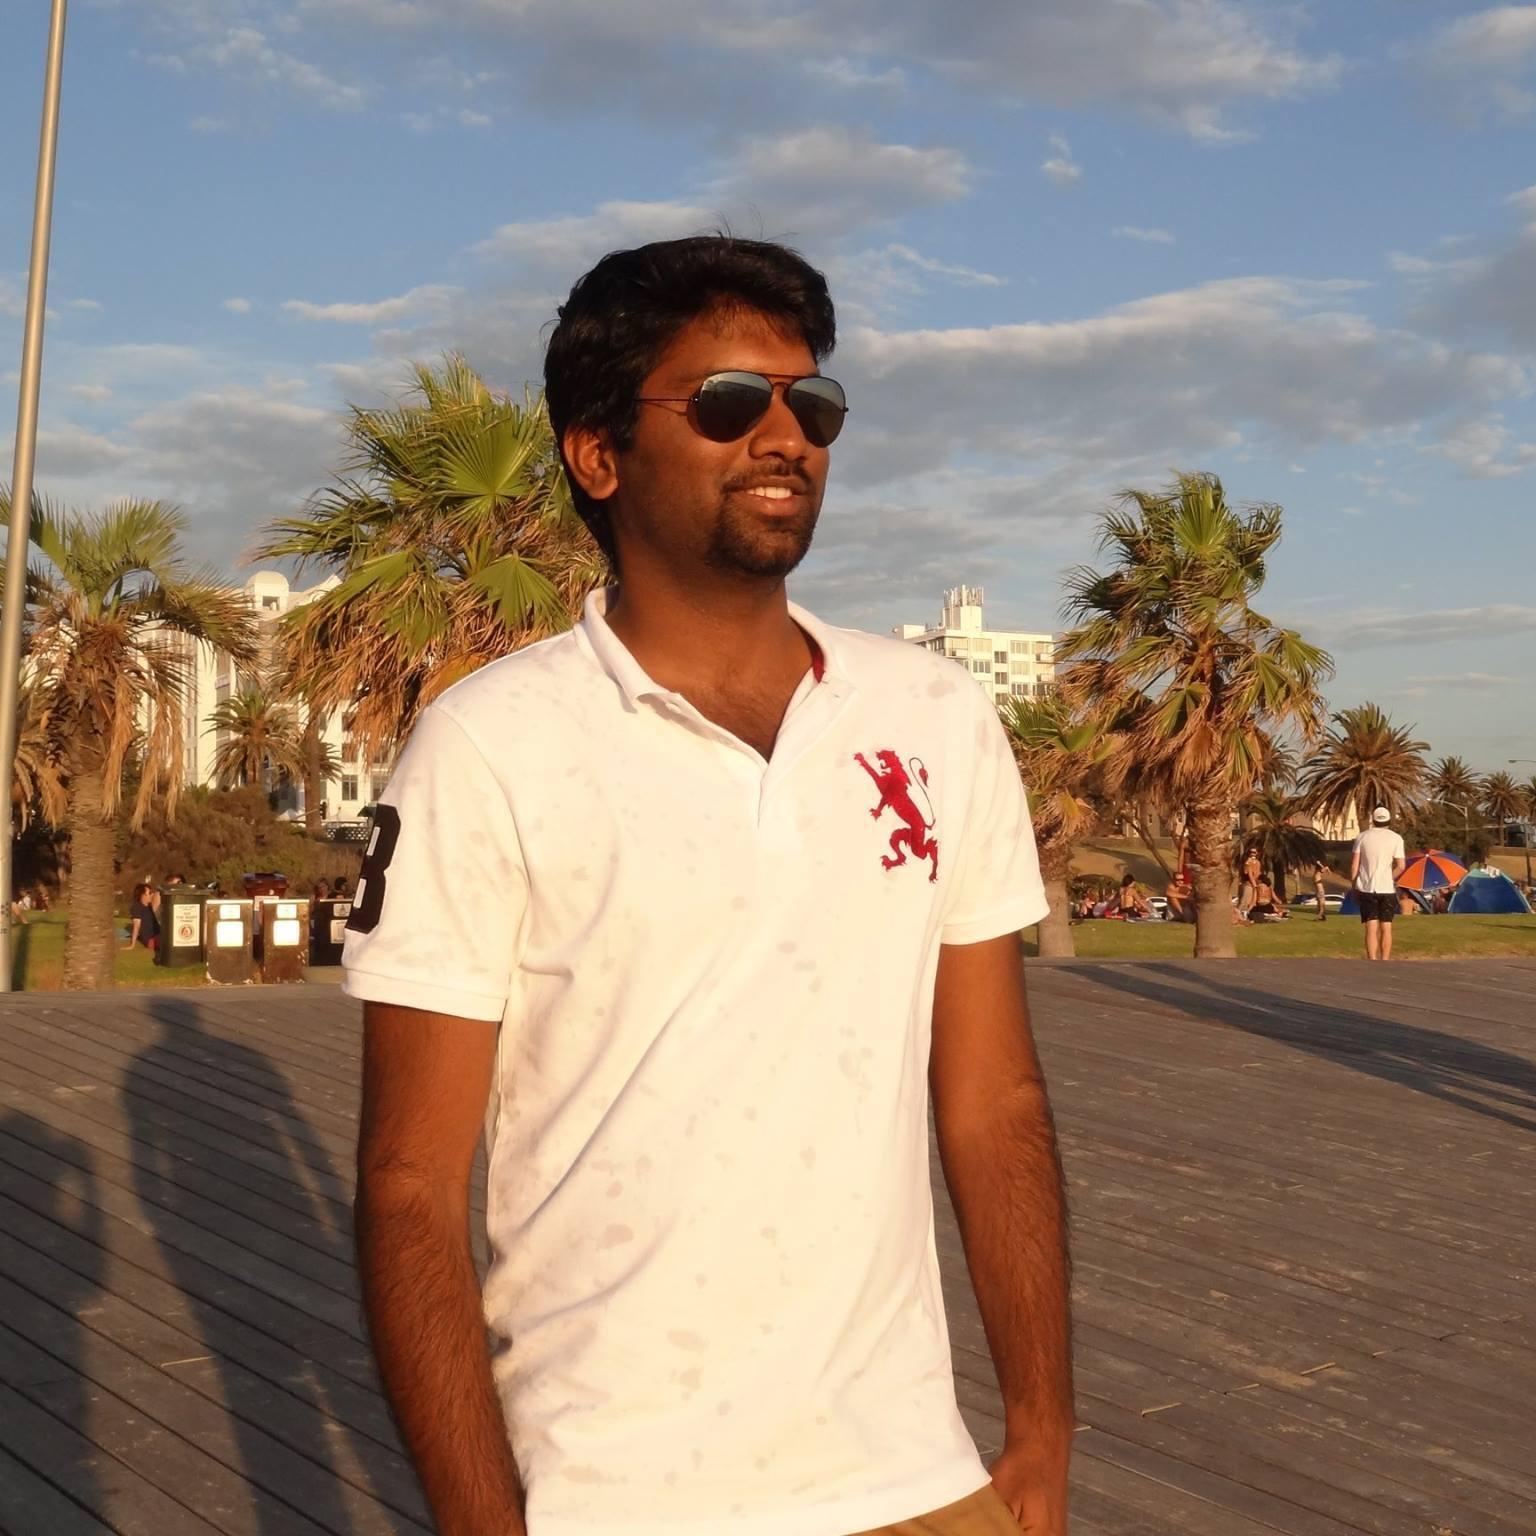 Vishnu Shanker's profile picture